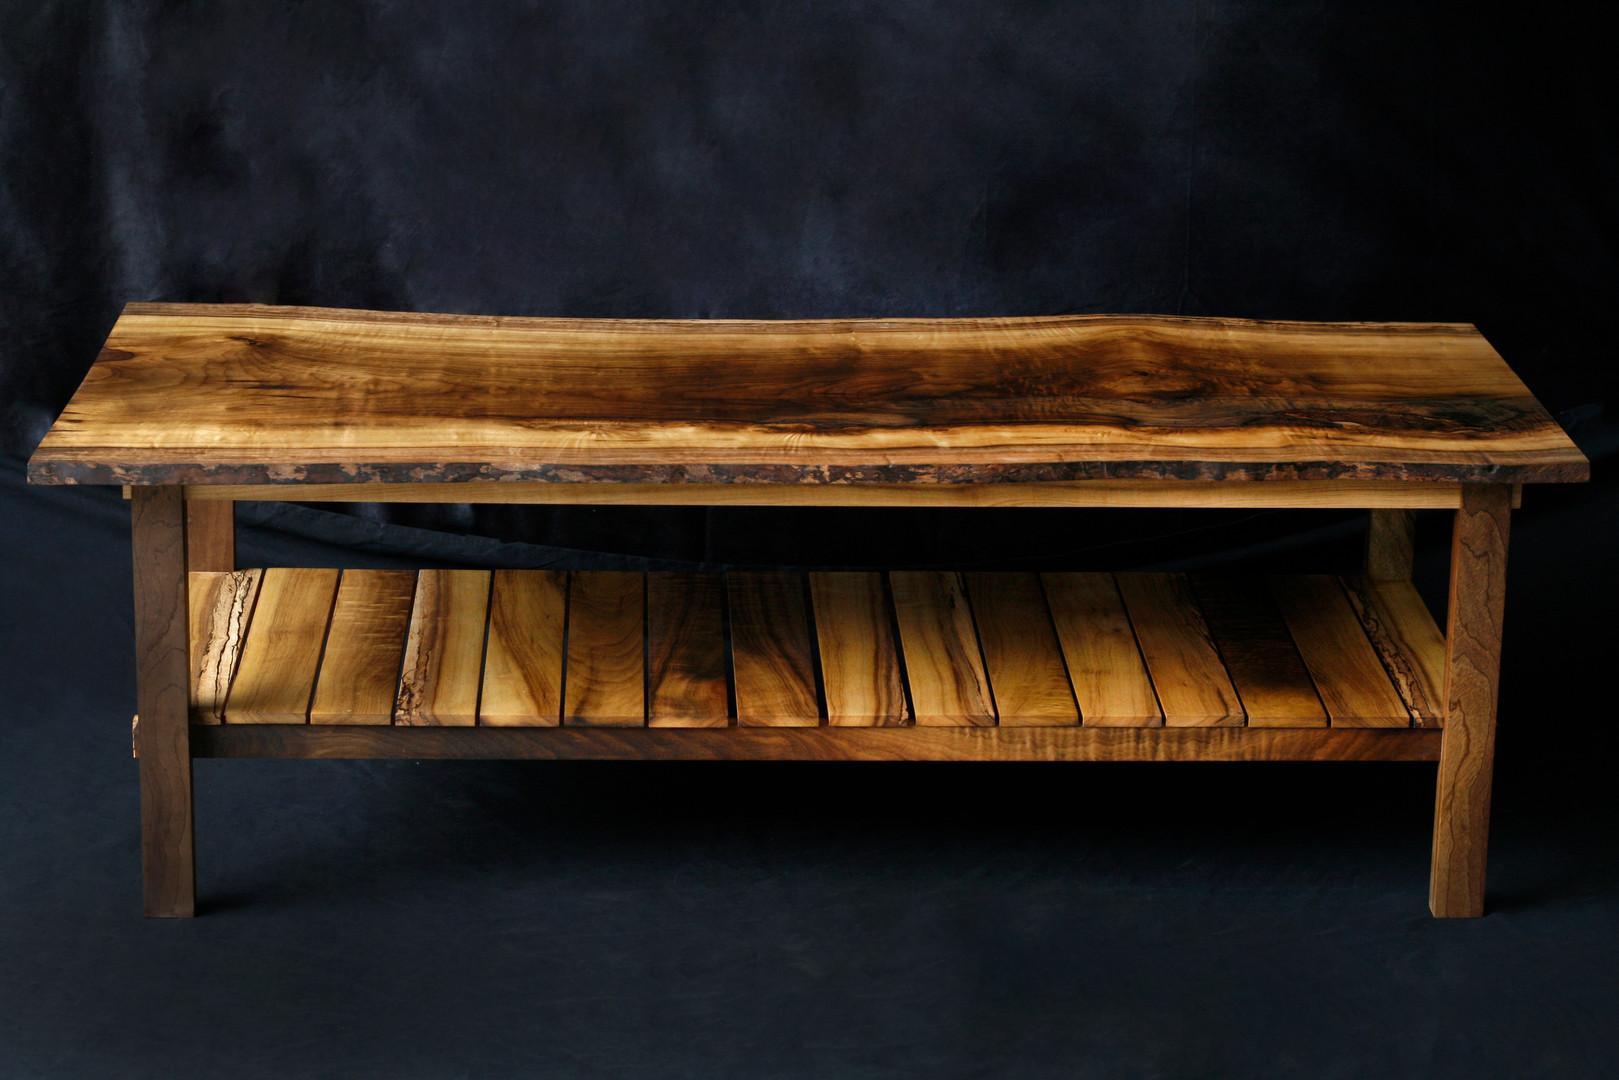 myrtle slats table 1.jpg